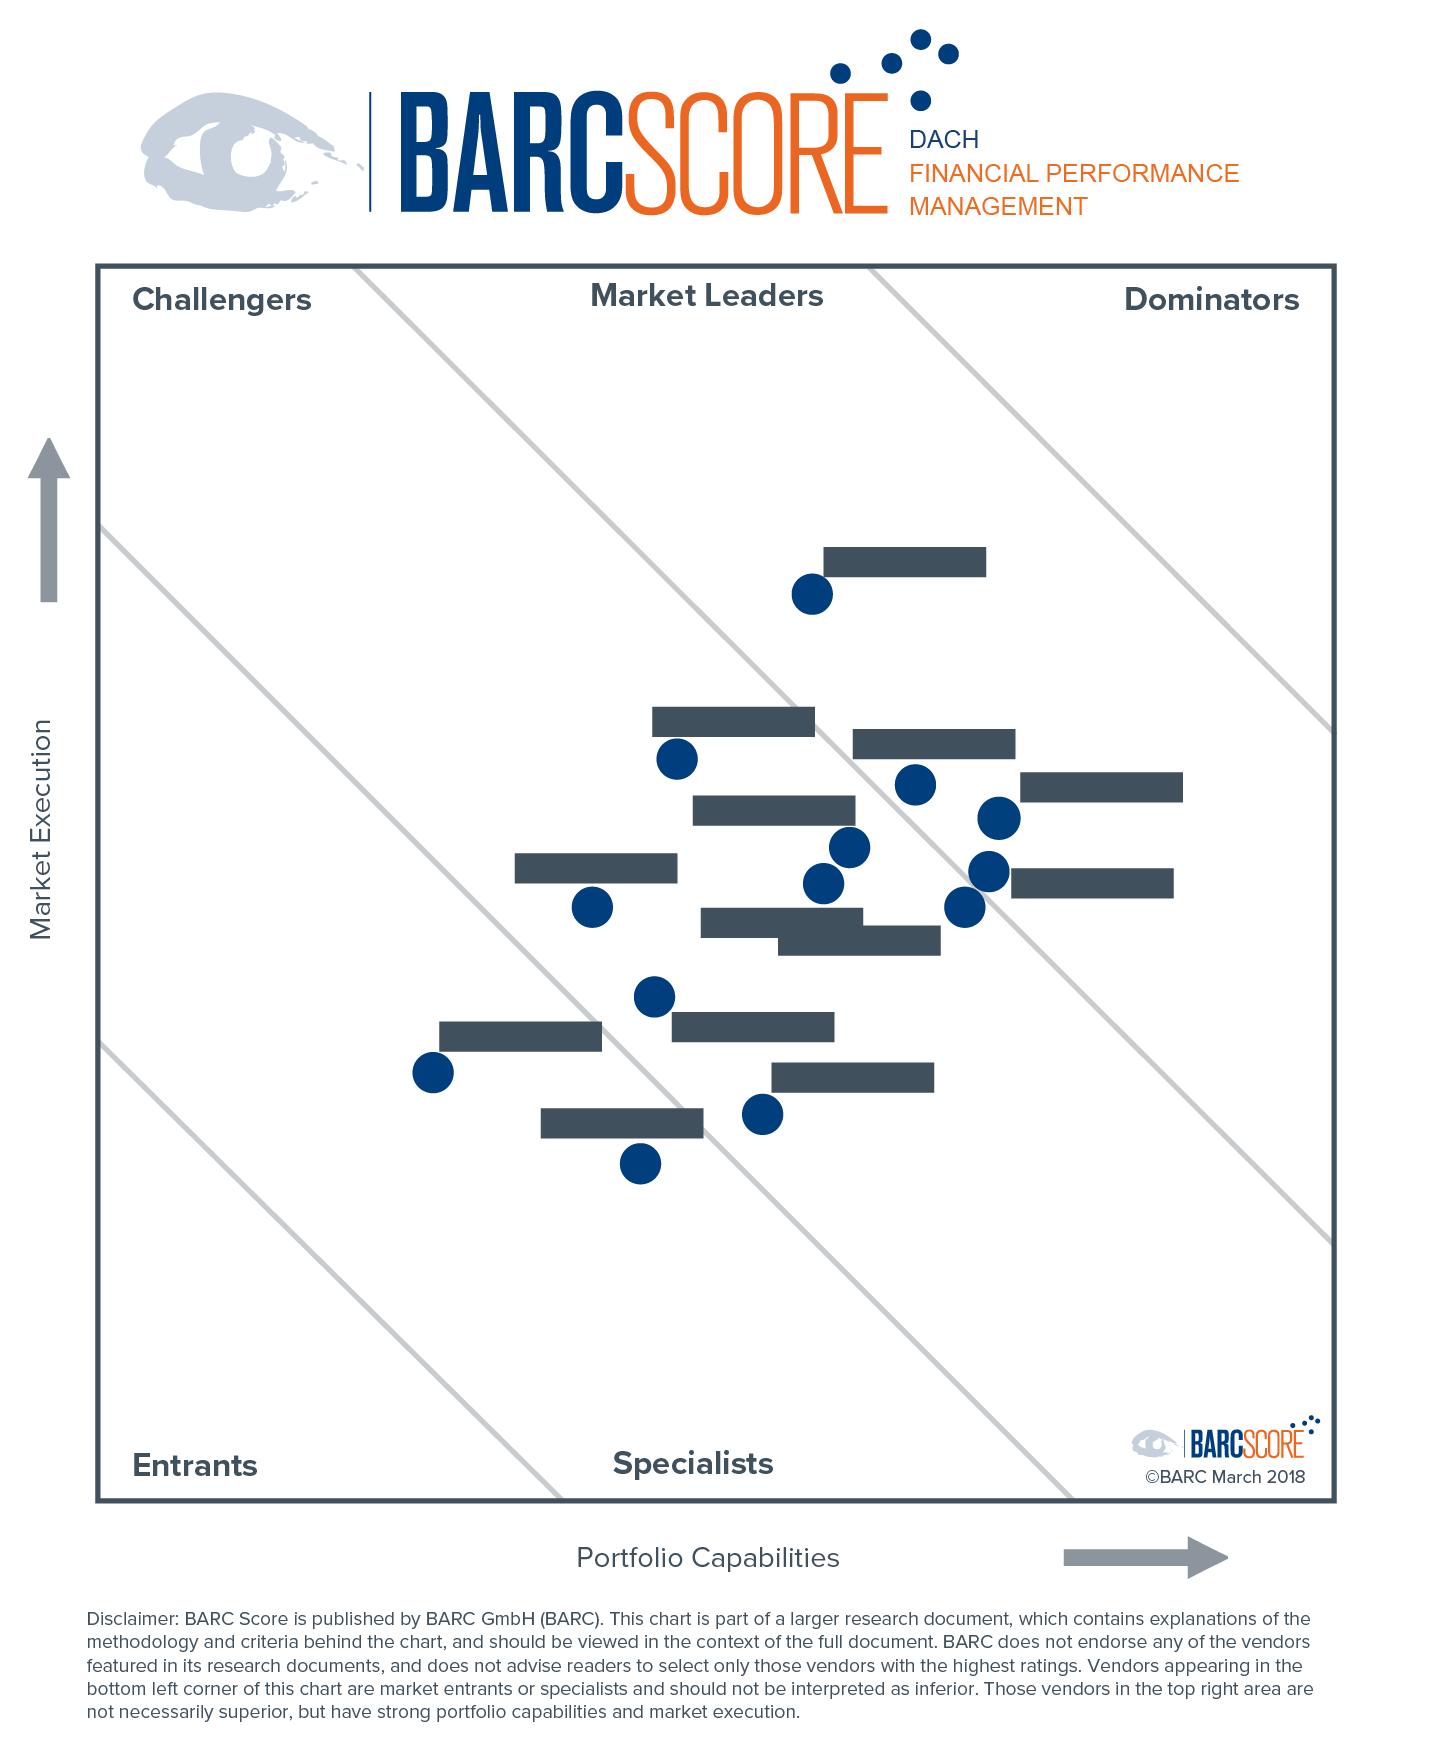 BARC Score FPM chart example